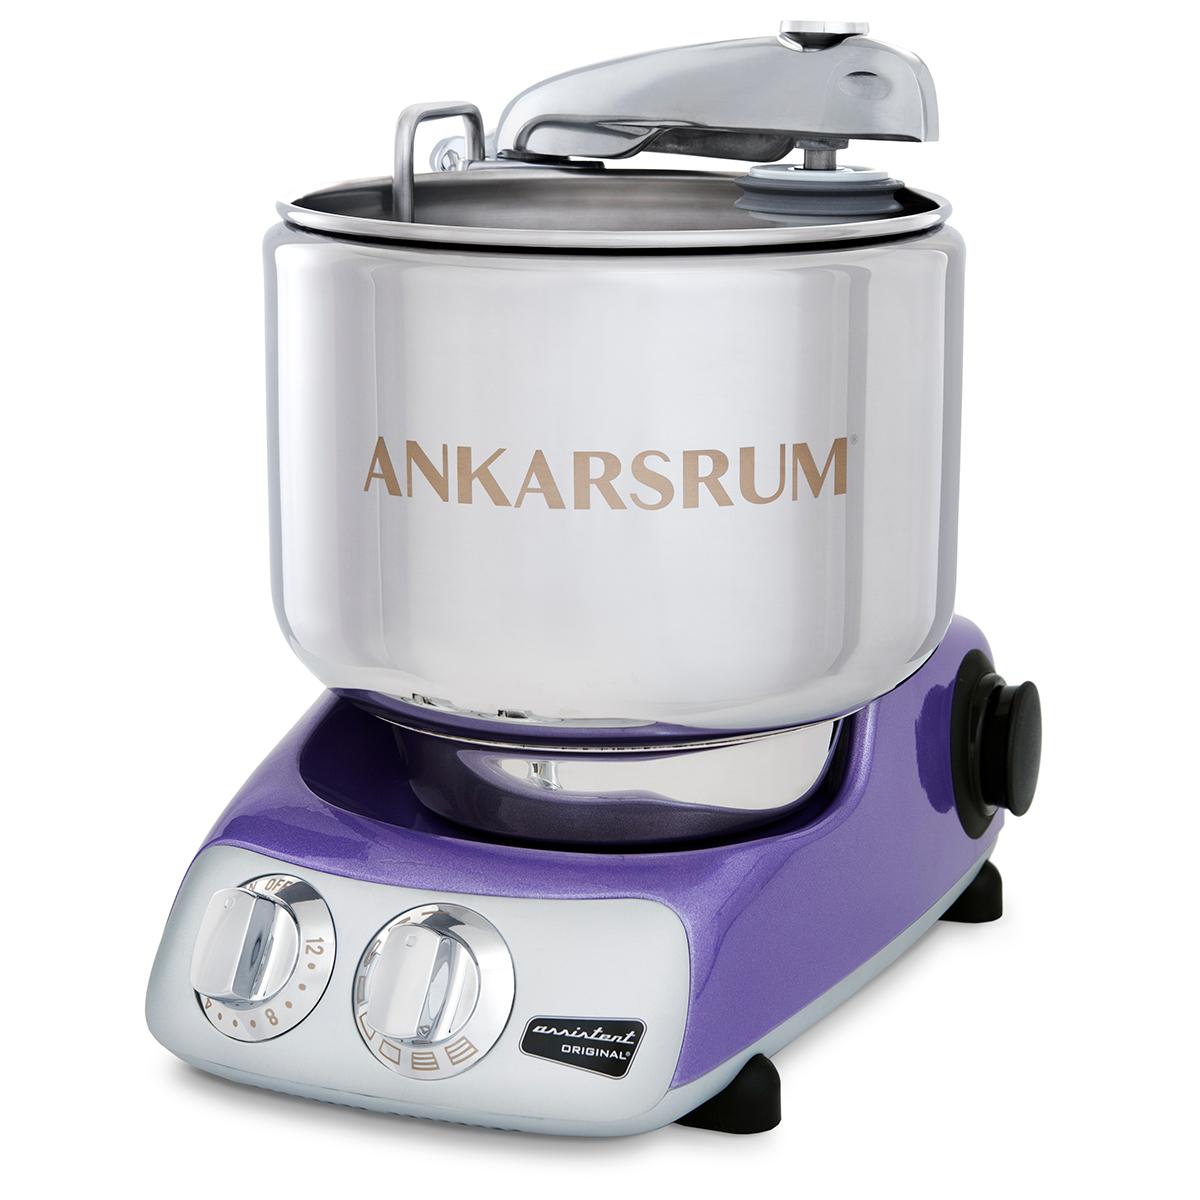 Image of   Ankarsrum køkkenmaskine Assistent Original AKM 6230 SL - Shiny Lilac